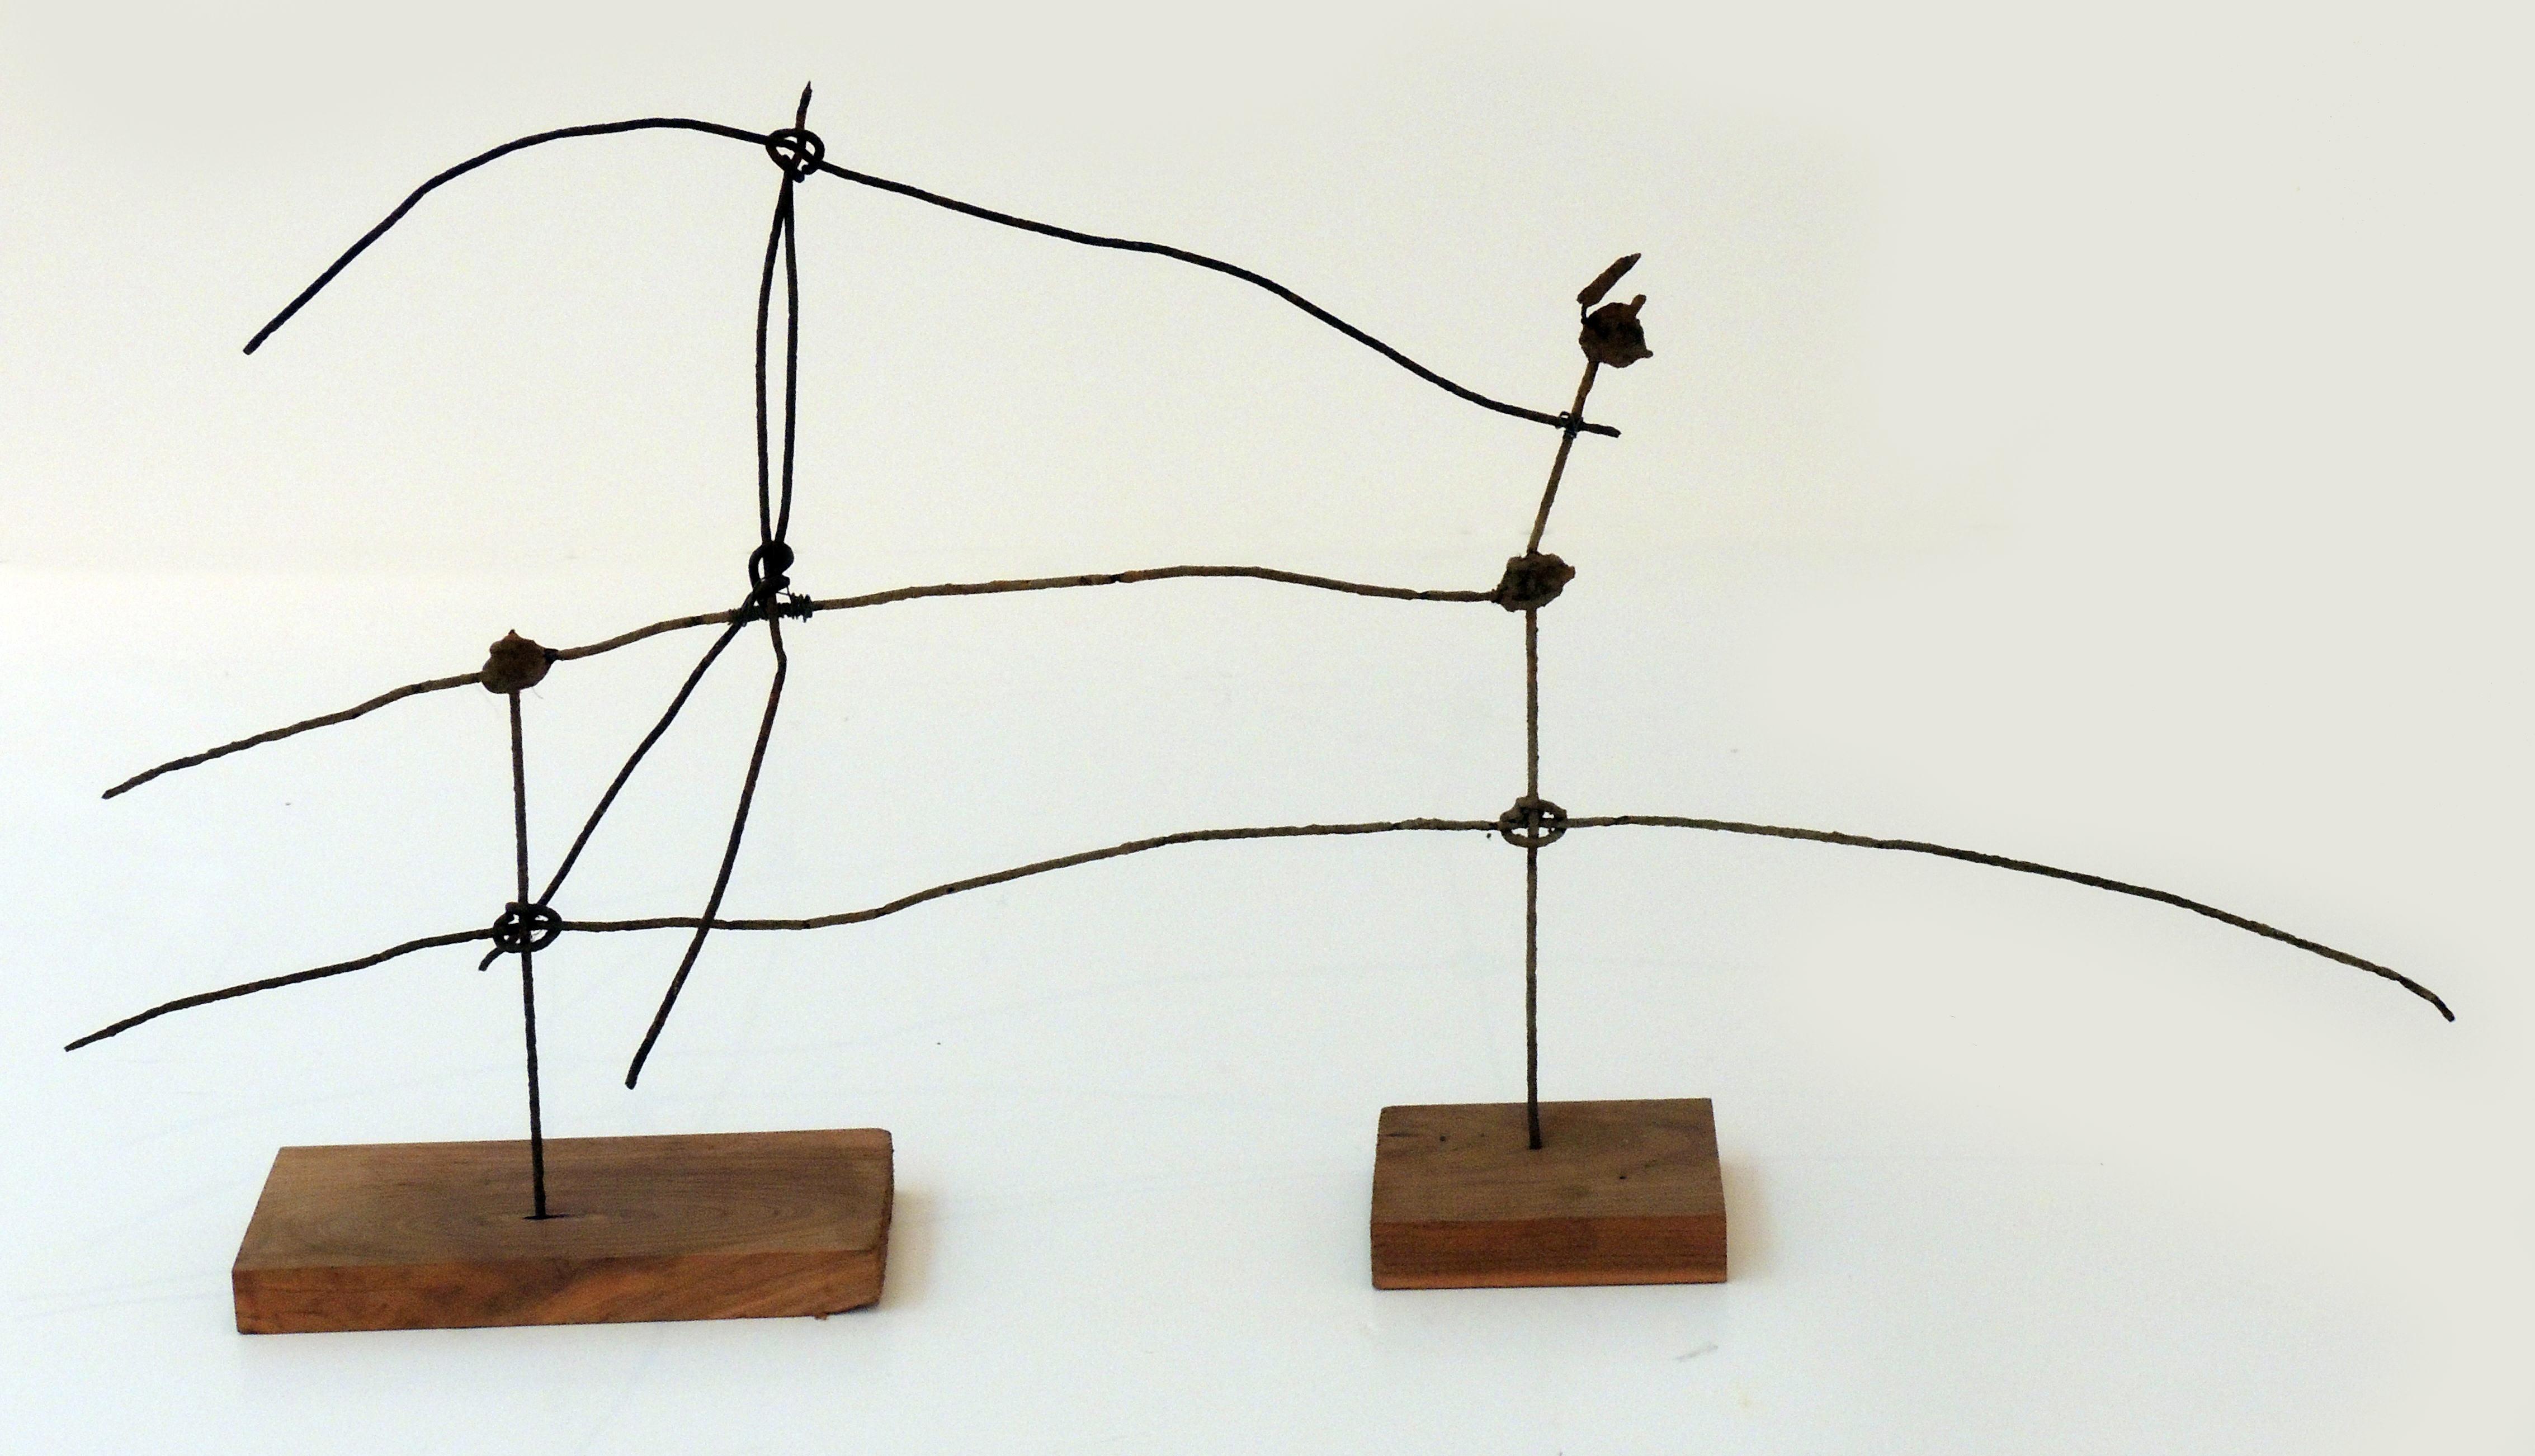 Richard Zopf | THE LAST WILD COWBOY | Iron wire